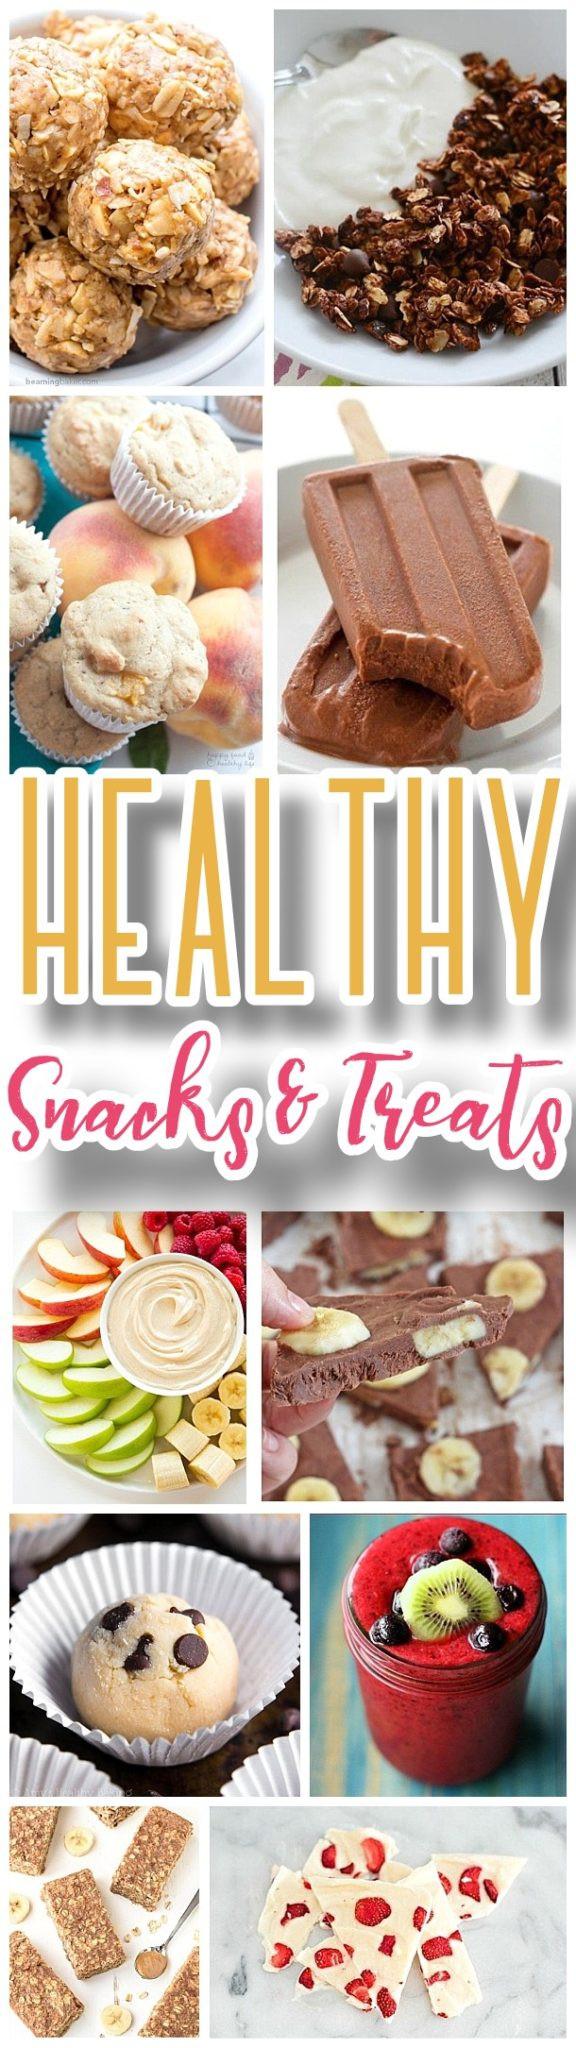 Easy Healthy Snacks To Make  Diy Easy To Make Snacks Diy Do It Your Self